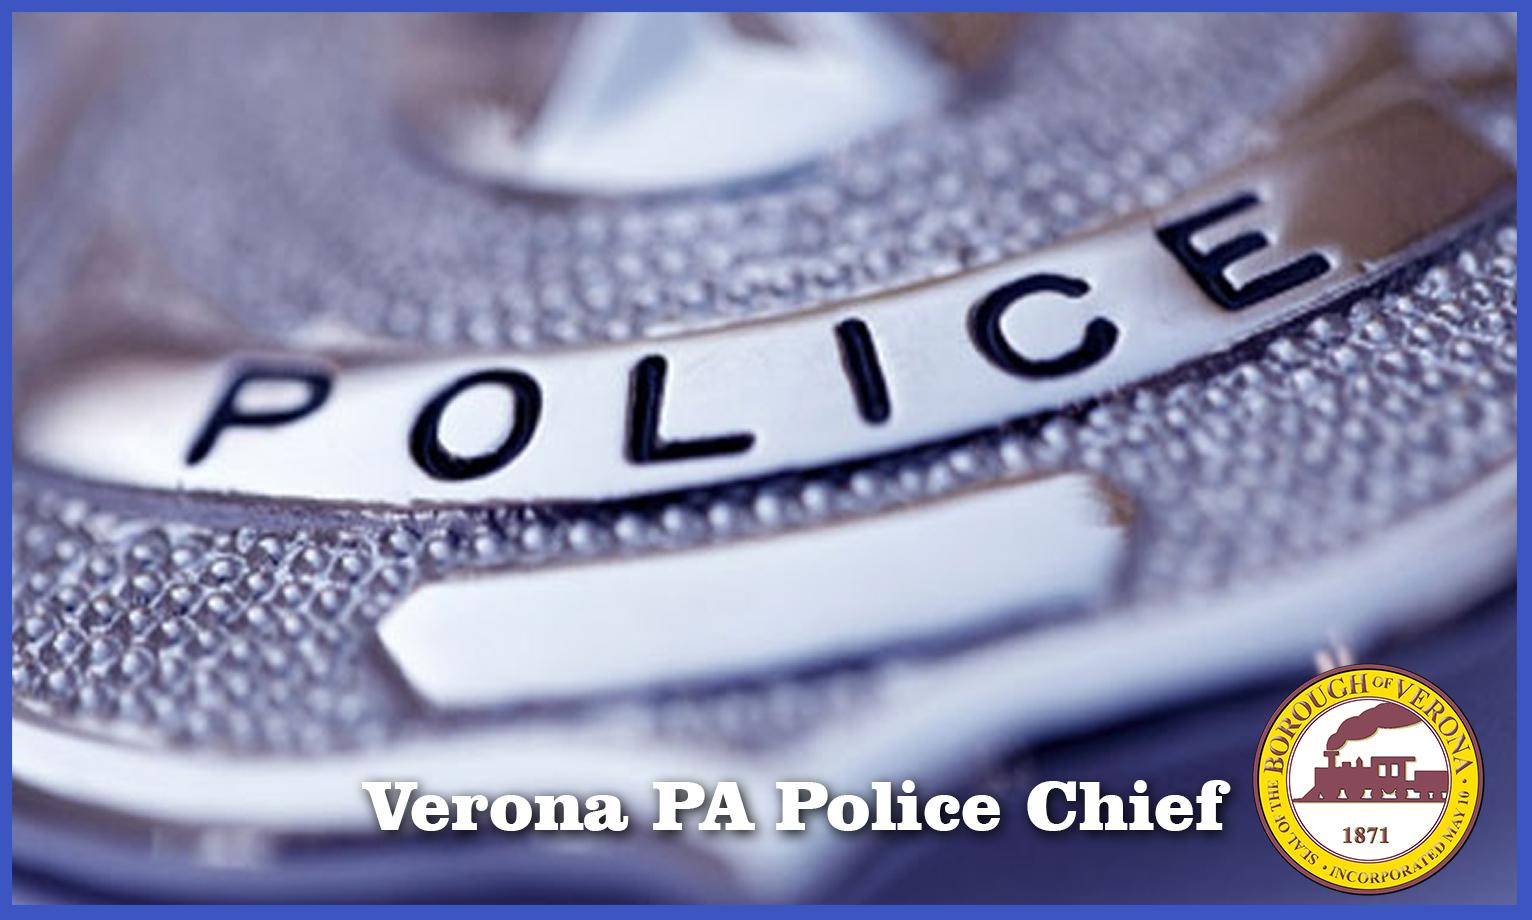 Verona PA Police chief